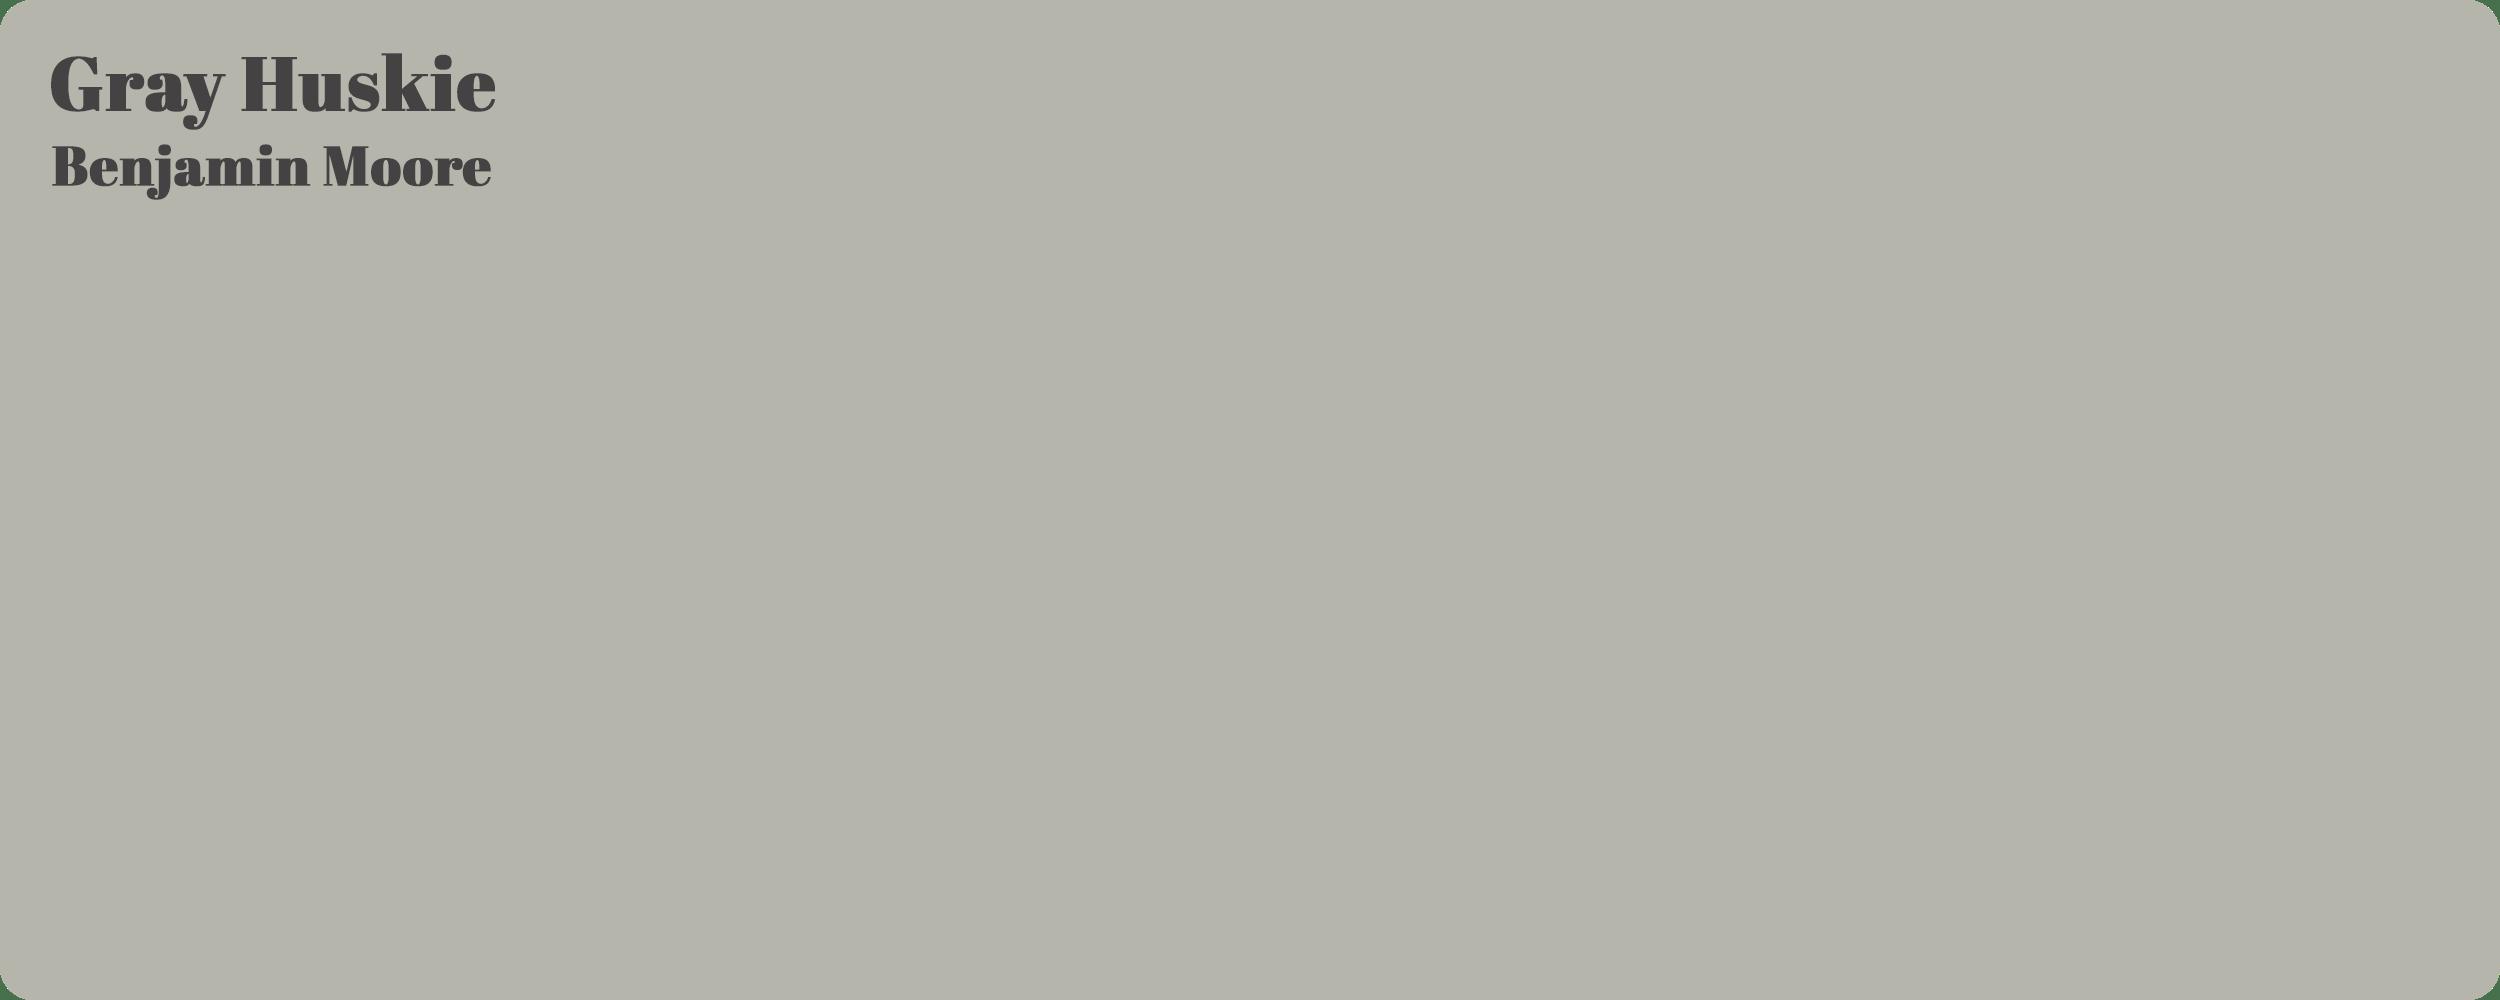 Gray Huskie